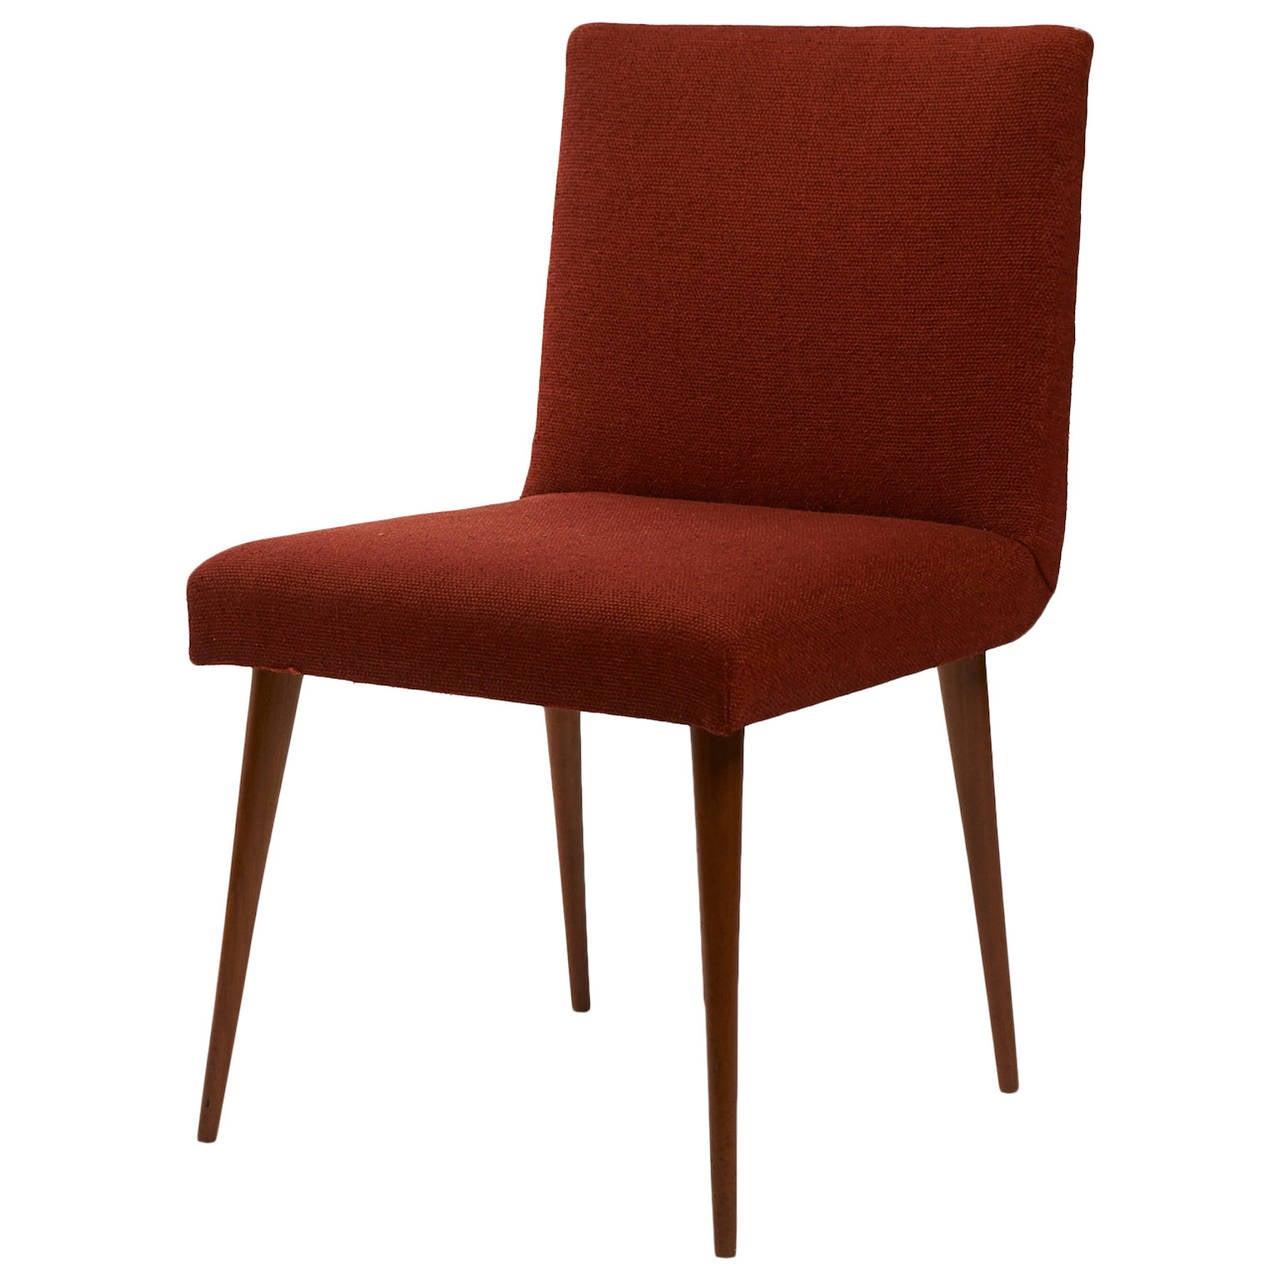 Joaquim Tenreiro Side Chair